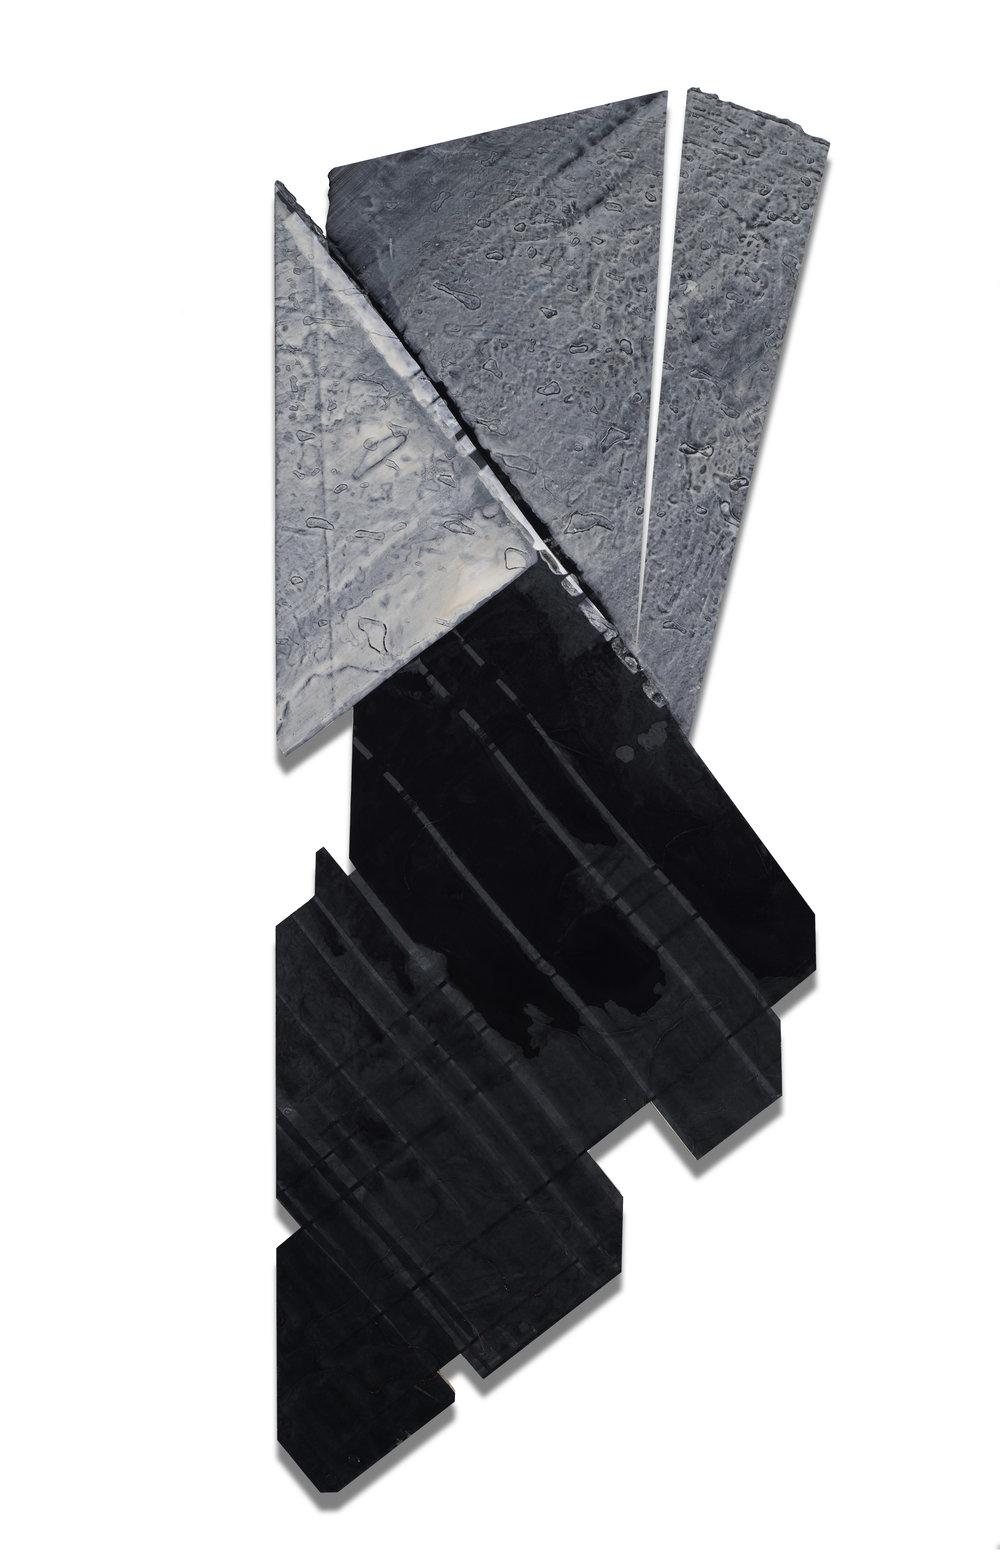 Monolith,  Perspective Series 2